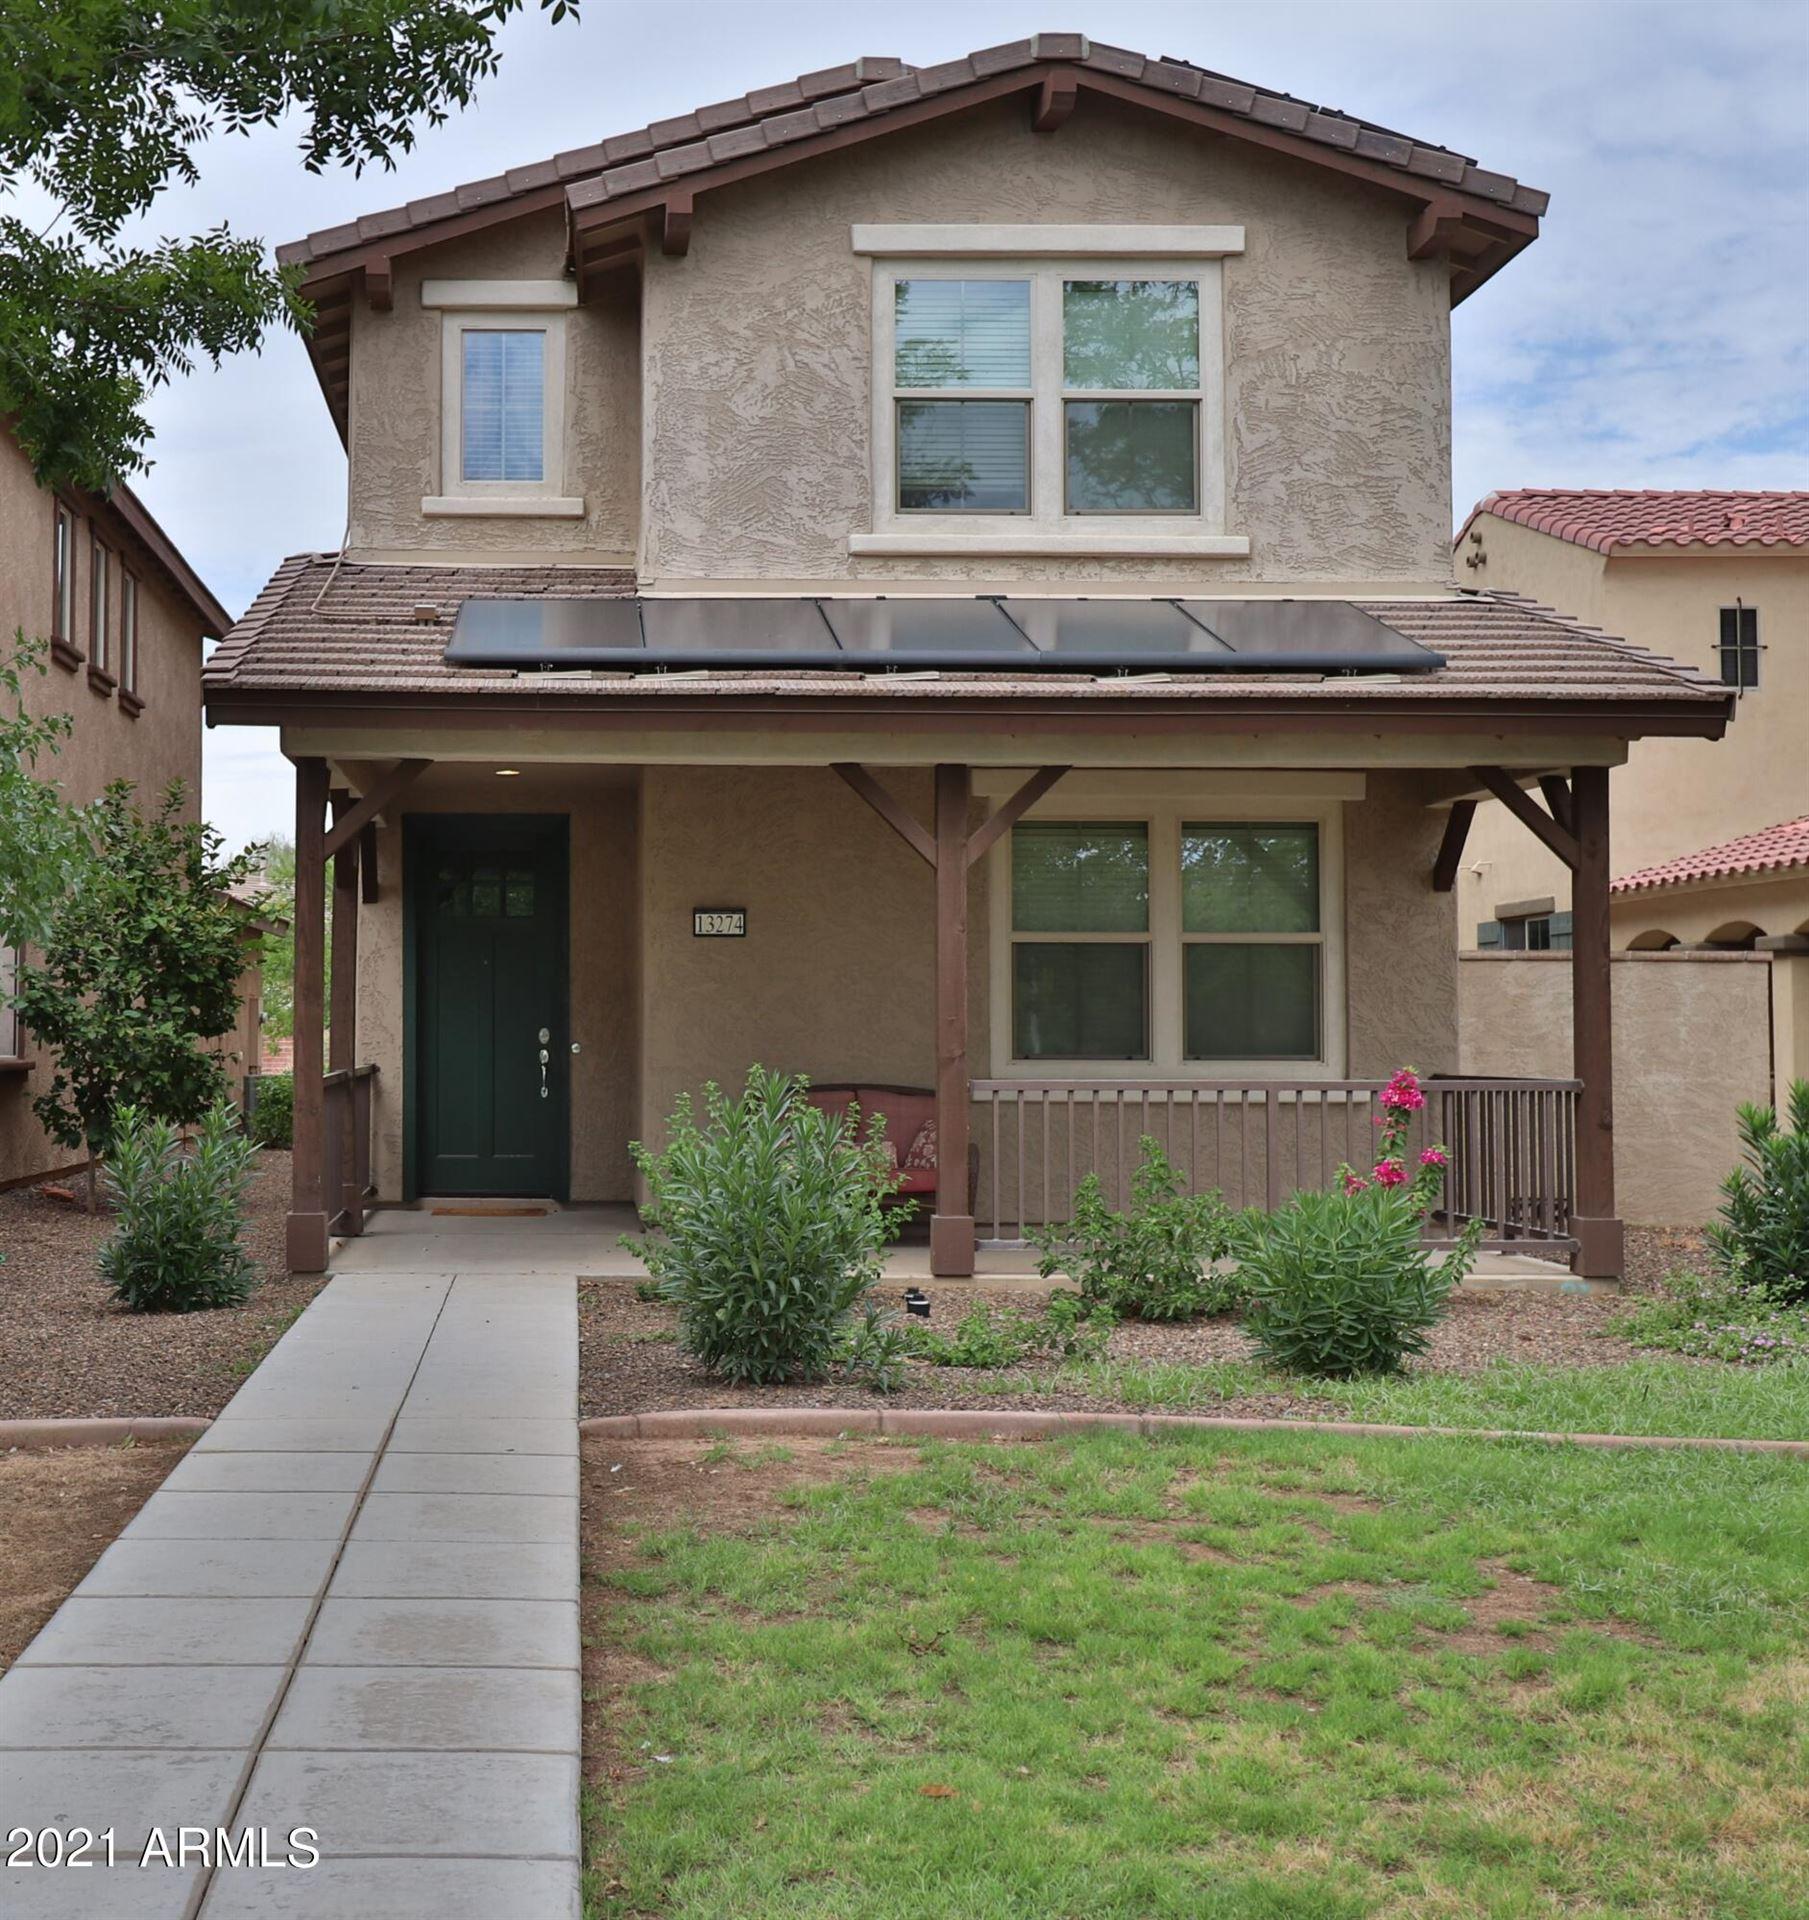 13274 N FOUNDERS PARK Boulevard, Surprise, AZ 85379 - MLS#: 6267413